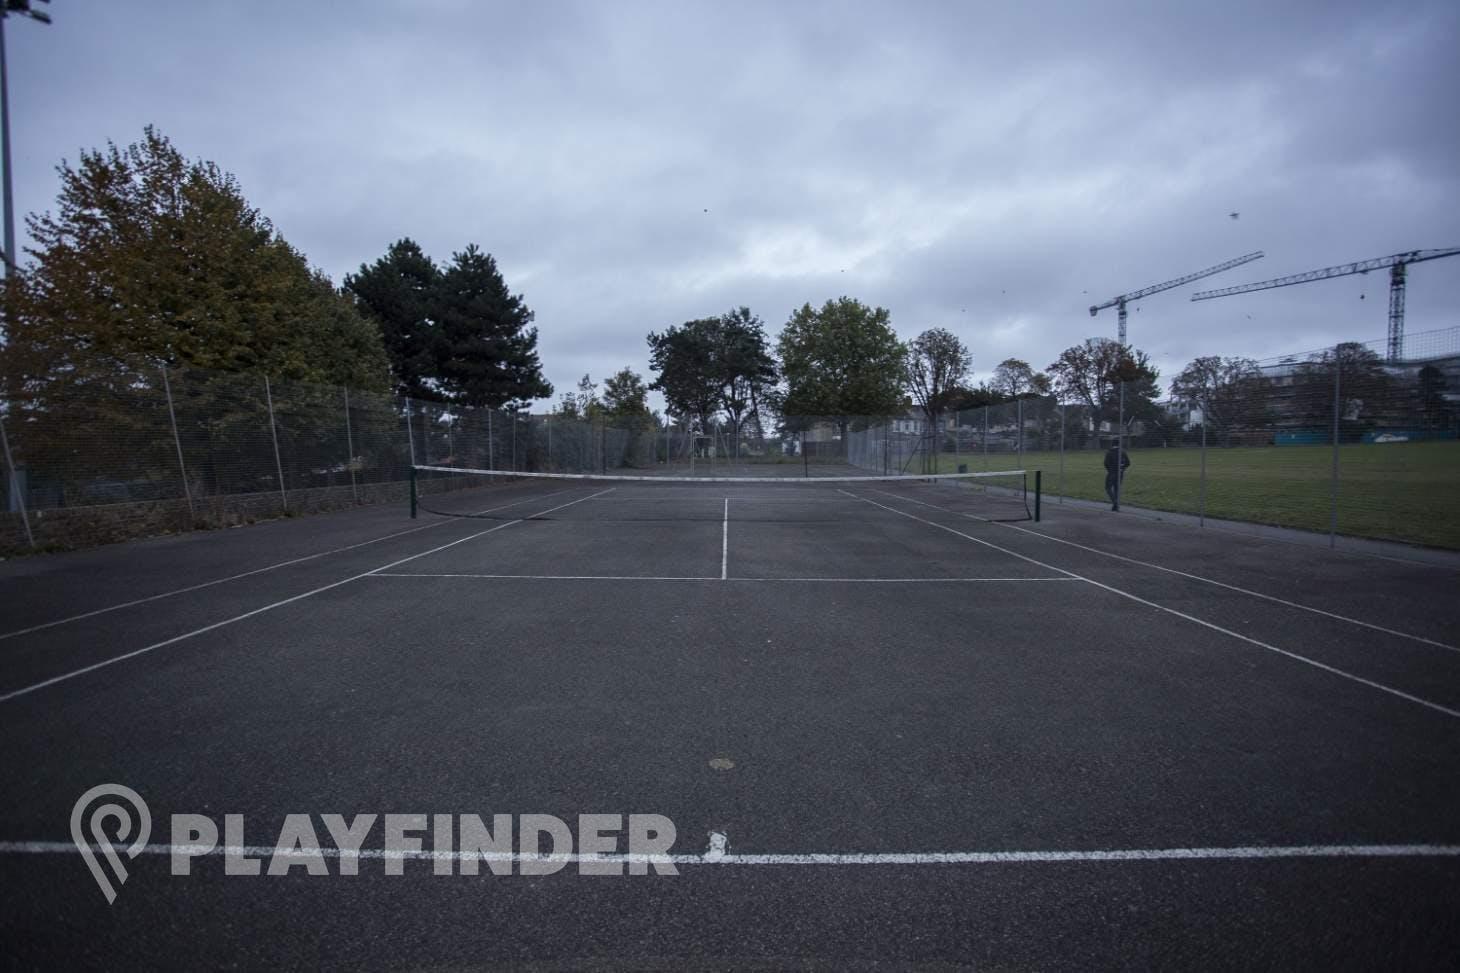 Erith Leisure Centre Outdoor   Hard (macadam) tennis court